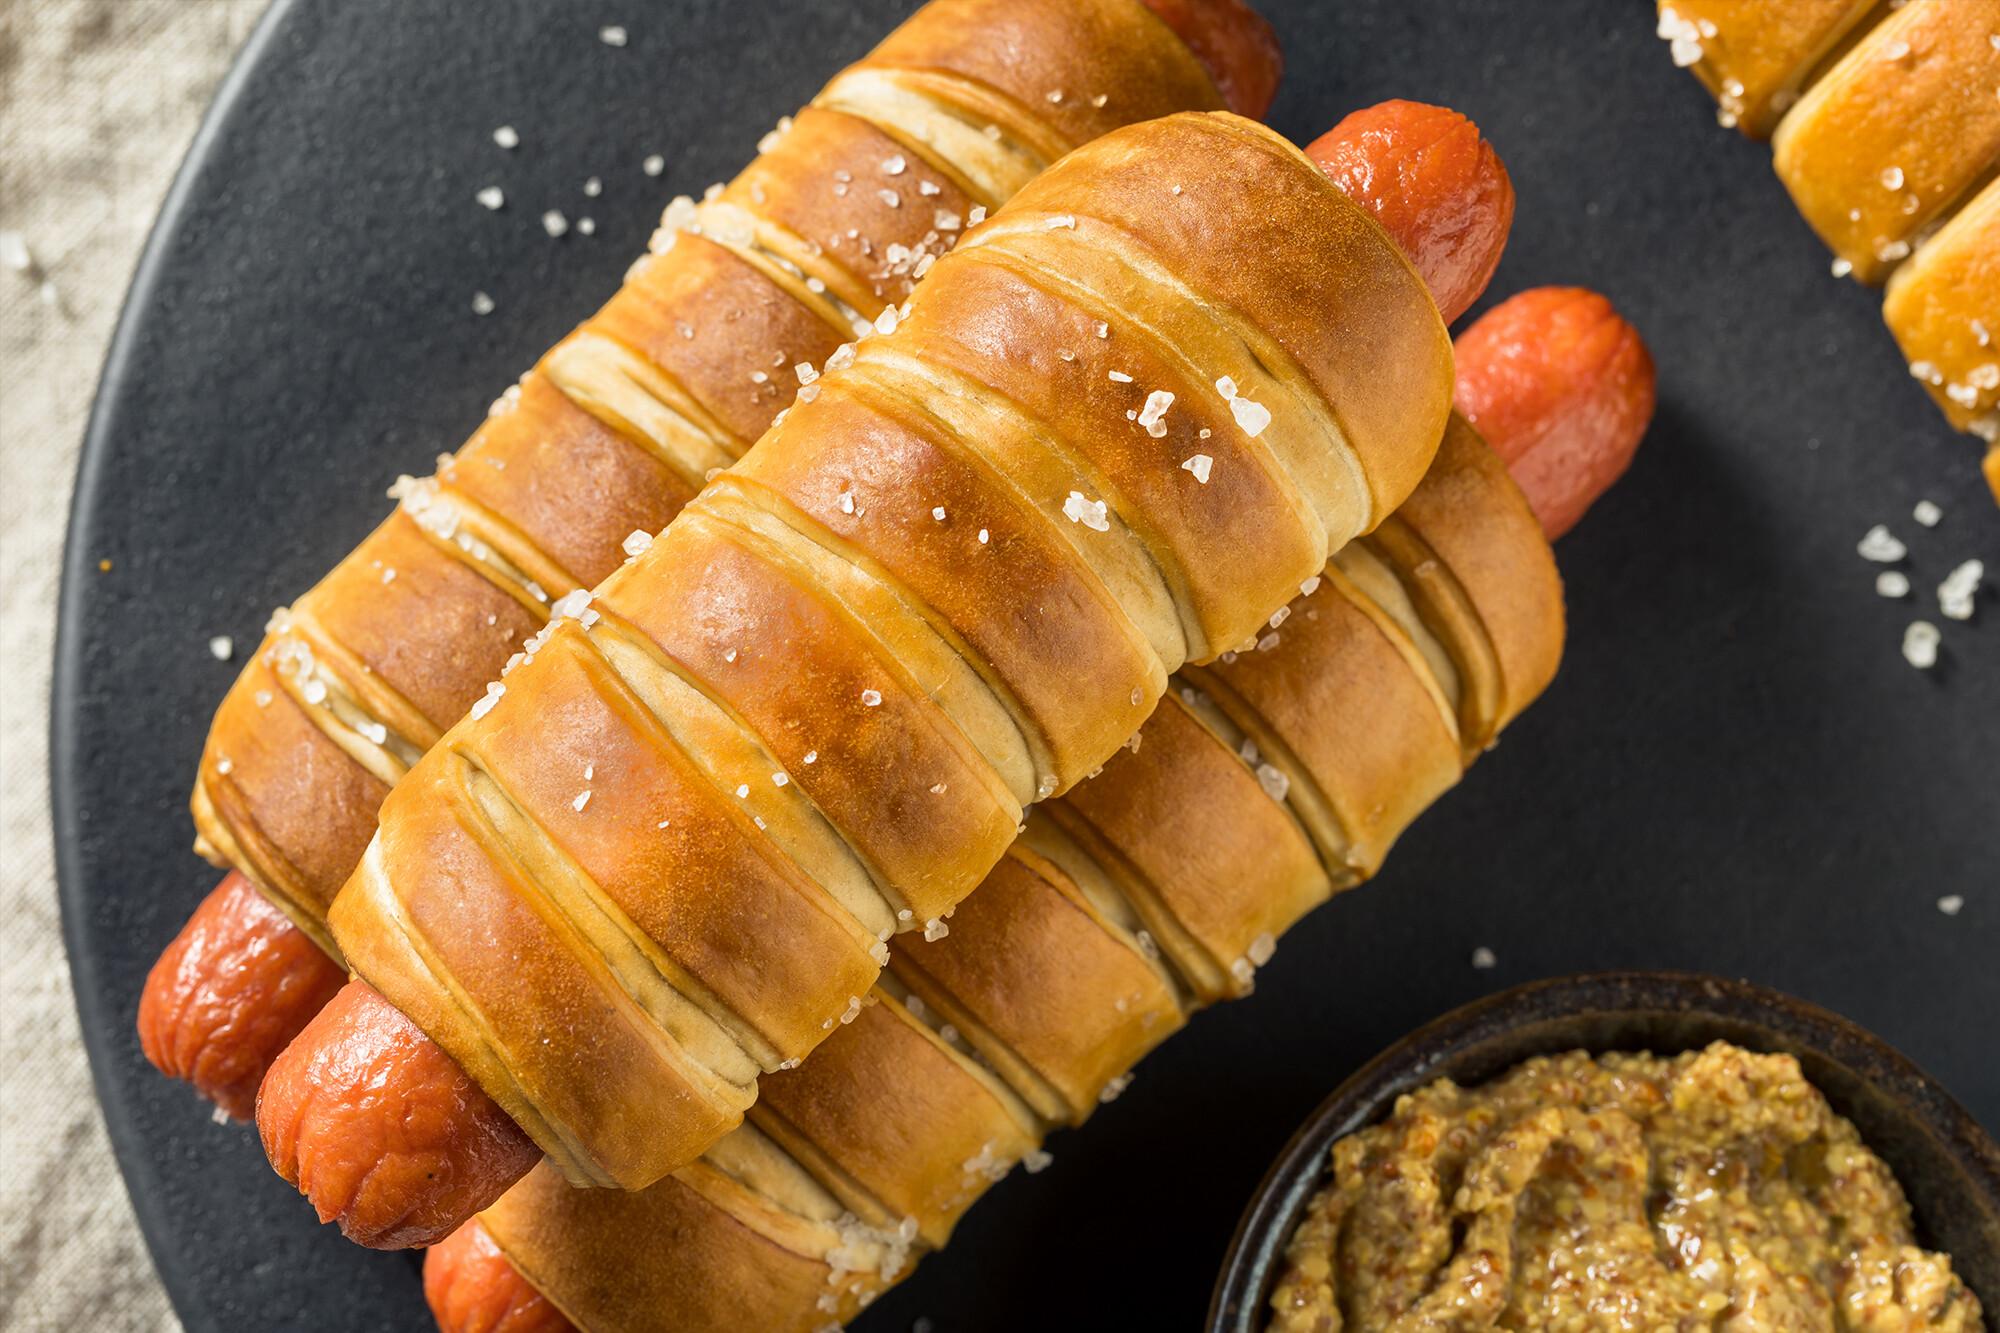 Marios Italian Deli | Picture of Pretzel Hot Dogs